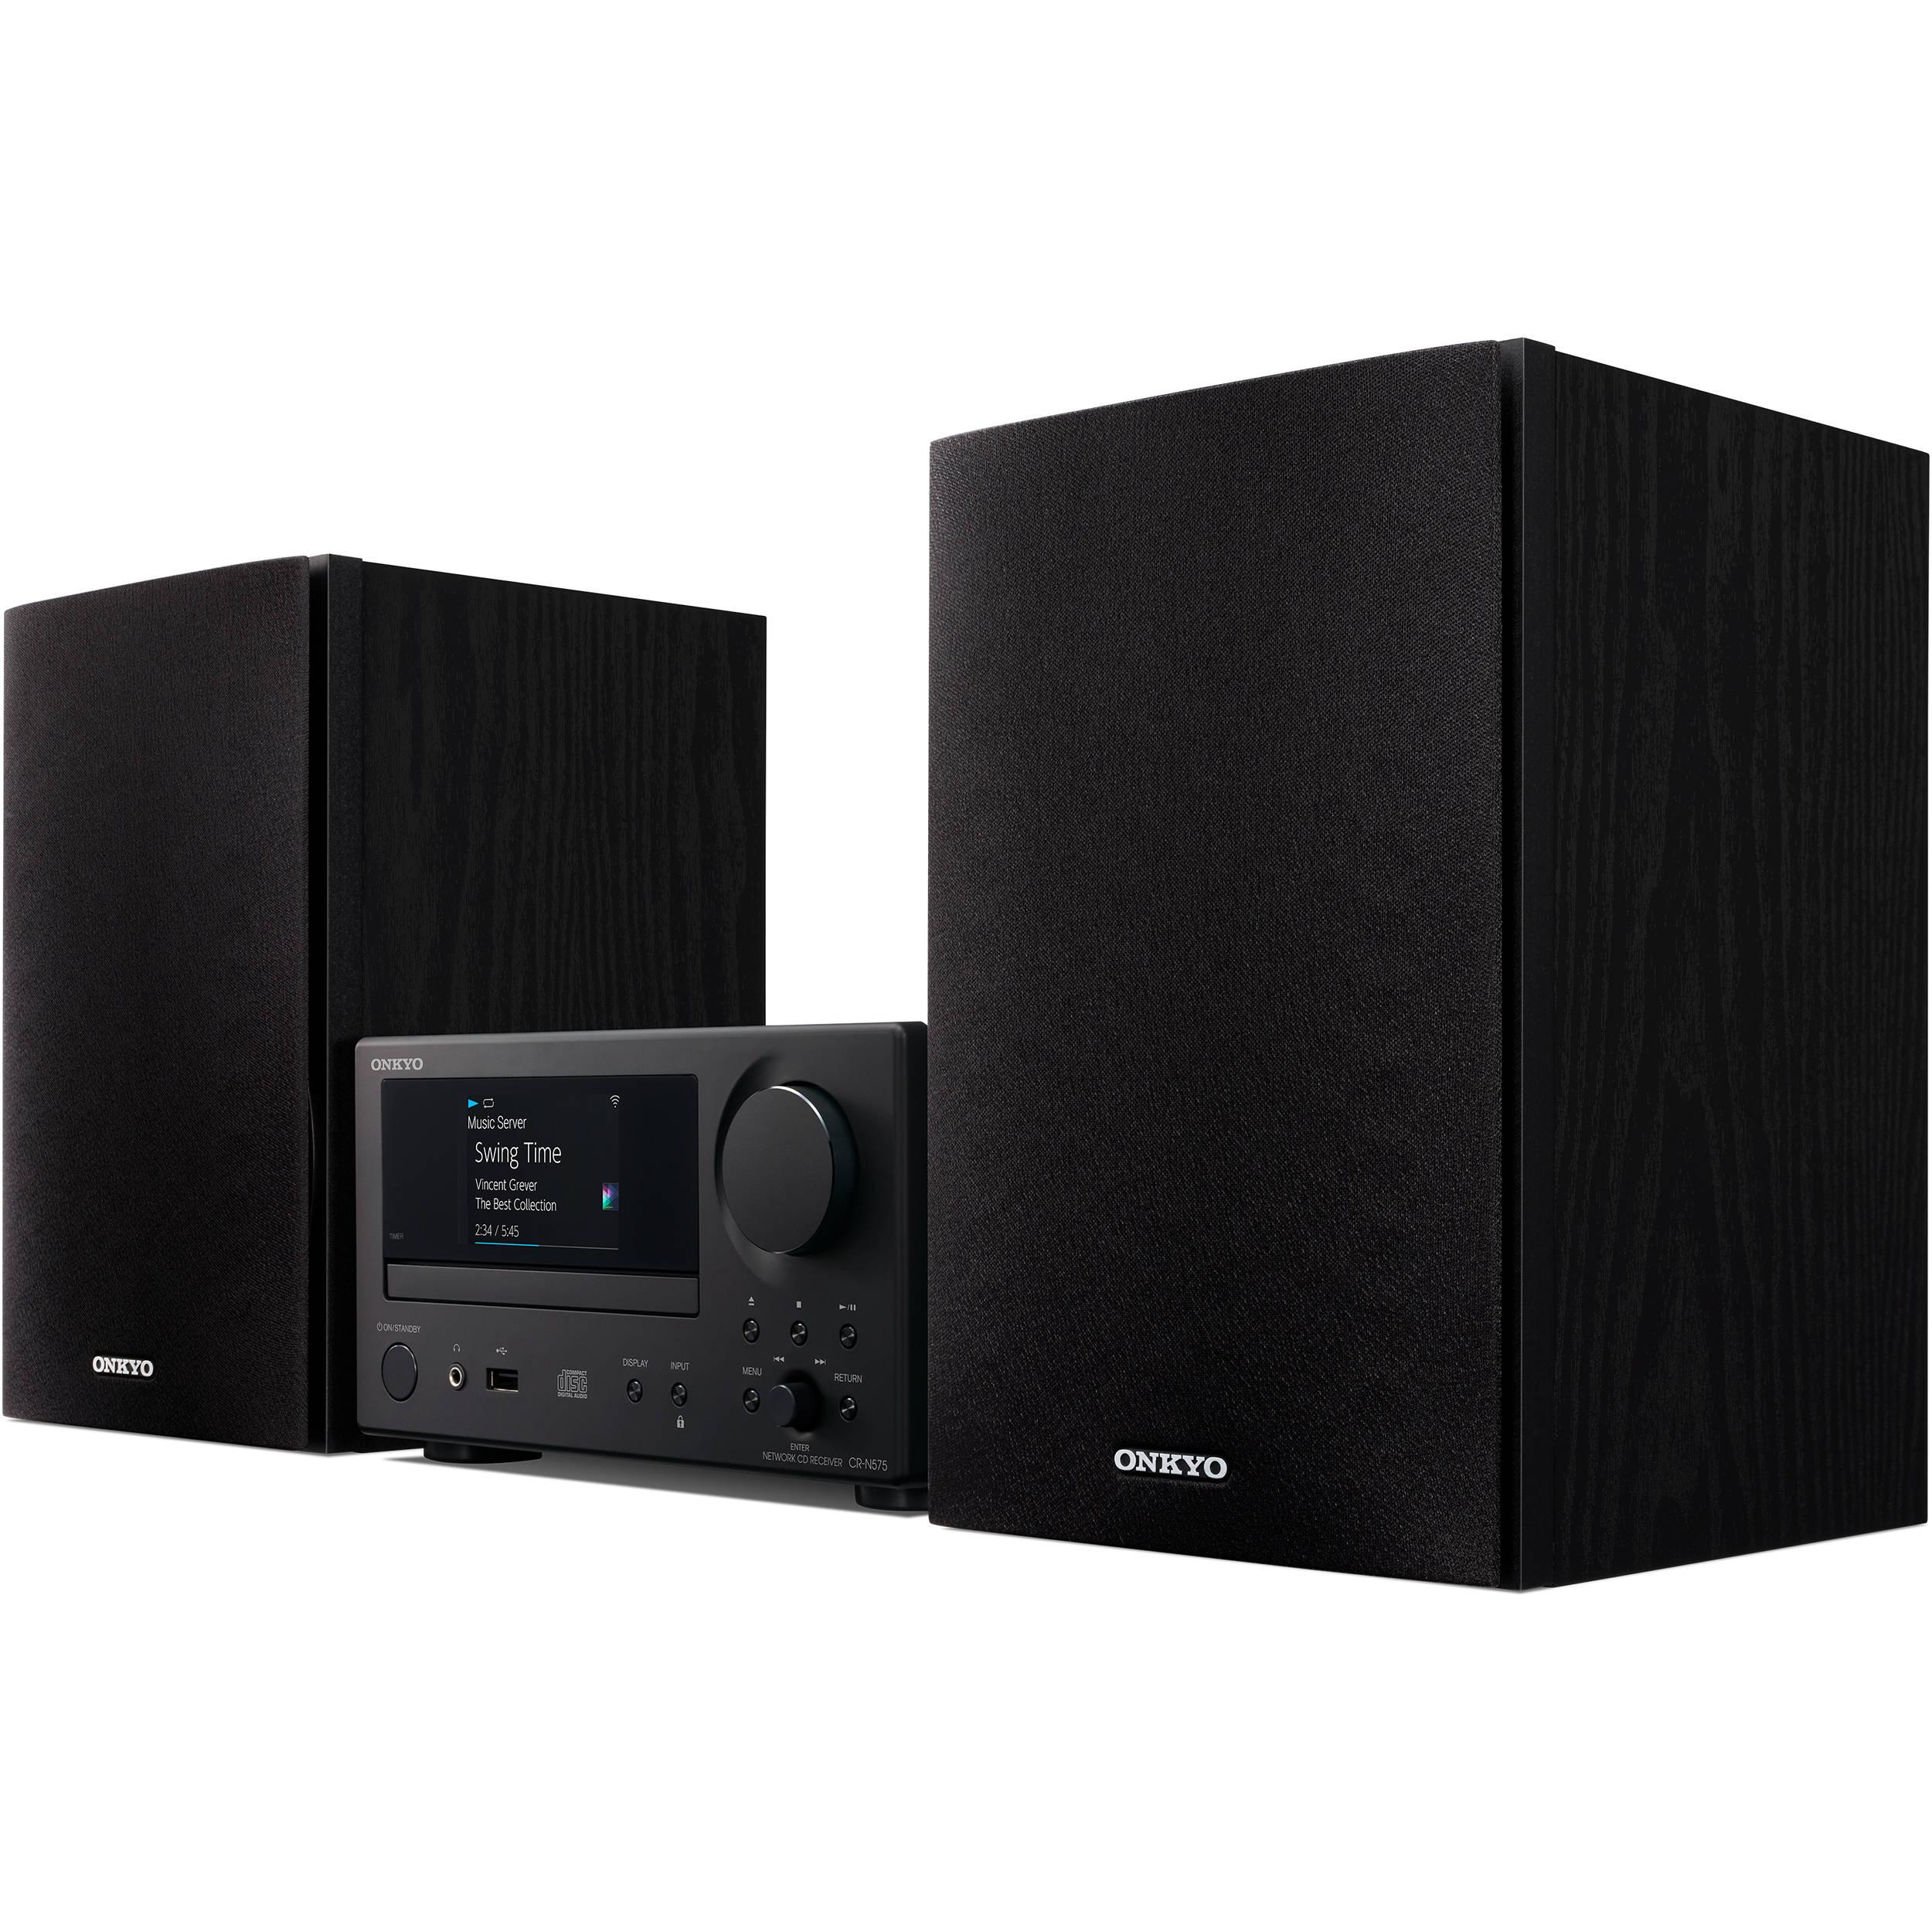 Onkyo Network Hi-Fi CD System Black CS-N575